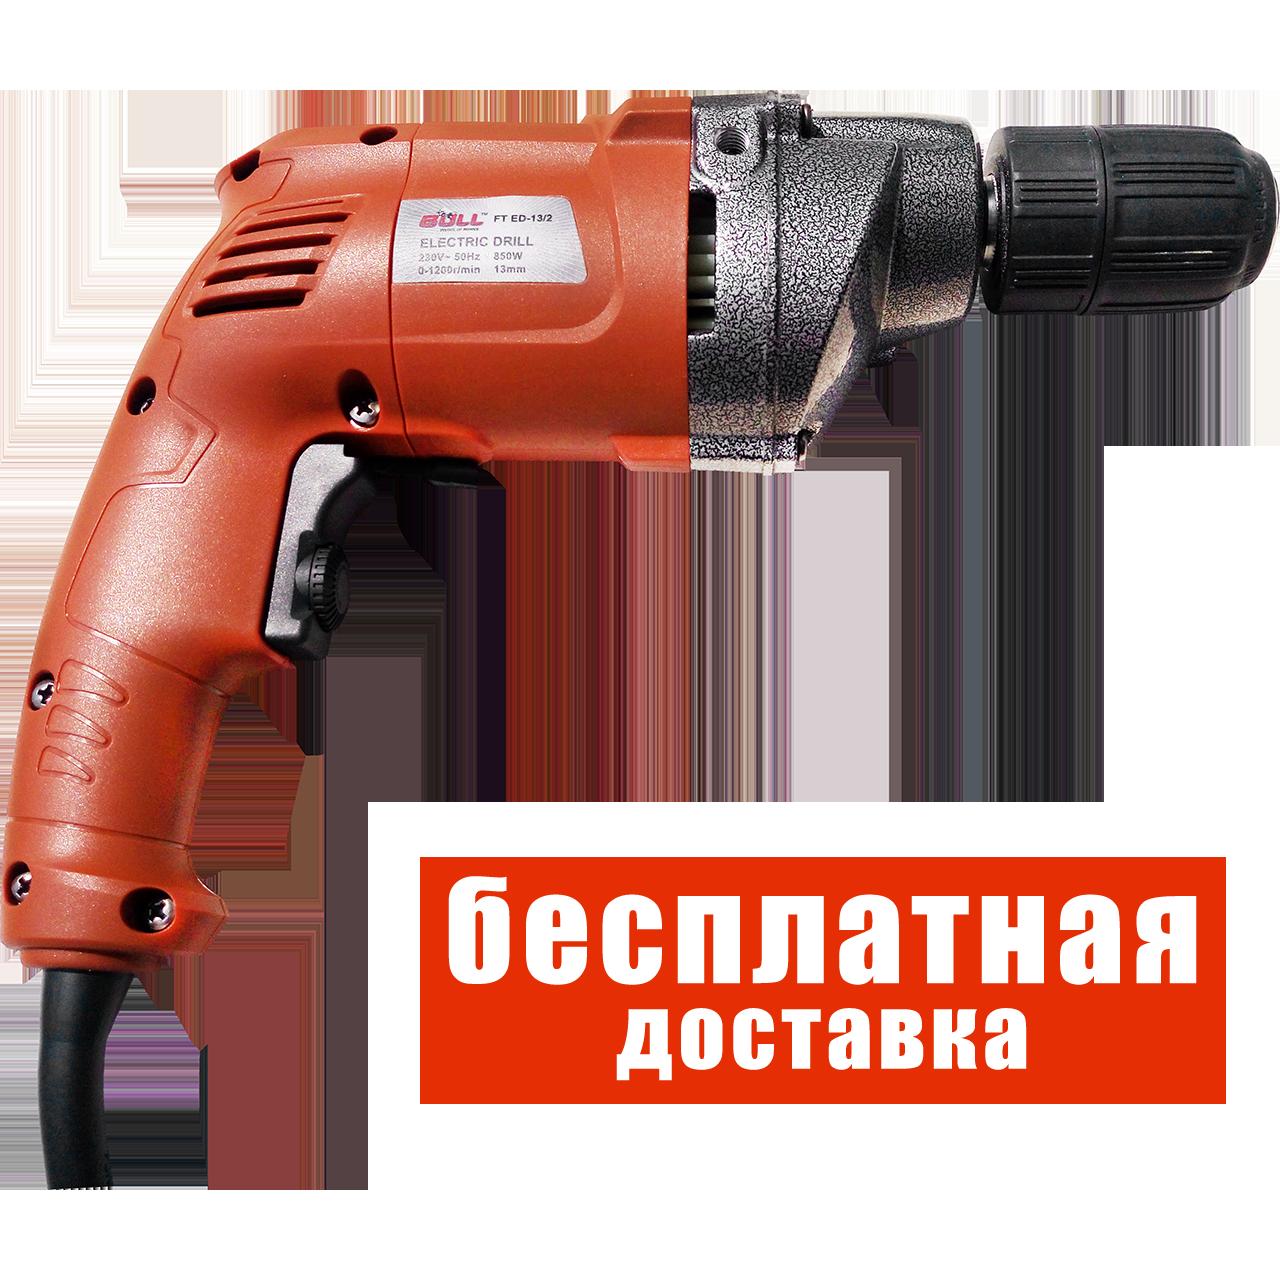 Электродрель Bull с реверсом и регуляцией, 13 мм патрон, FT ED-13/2